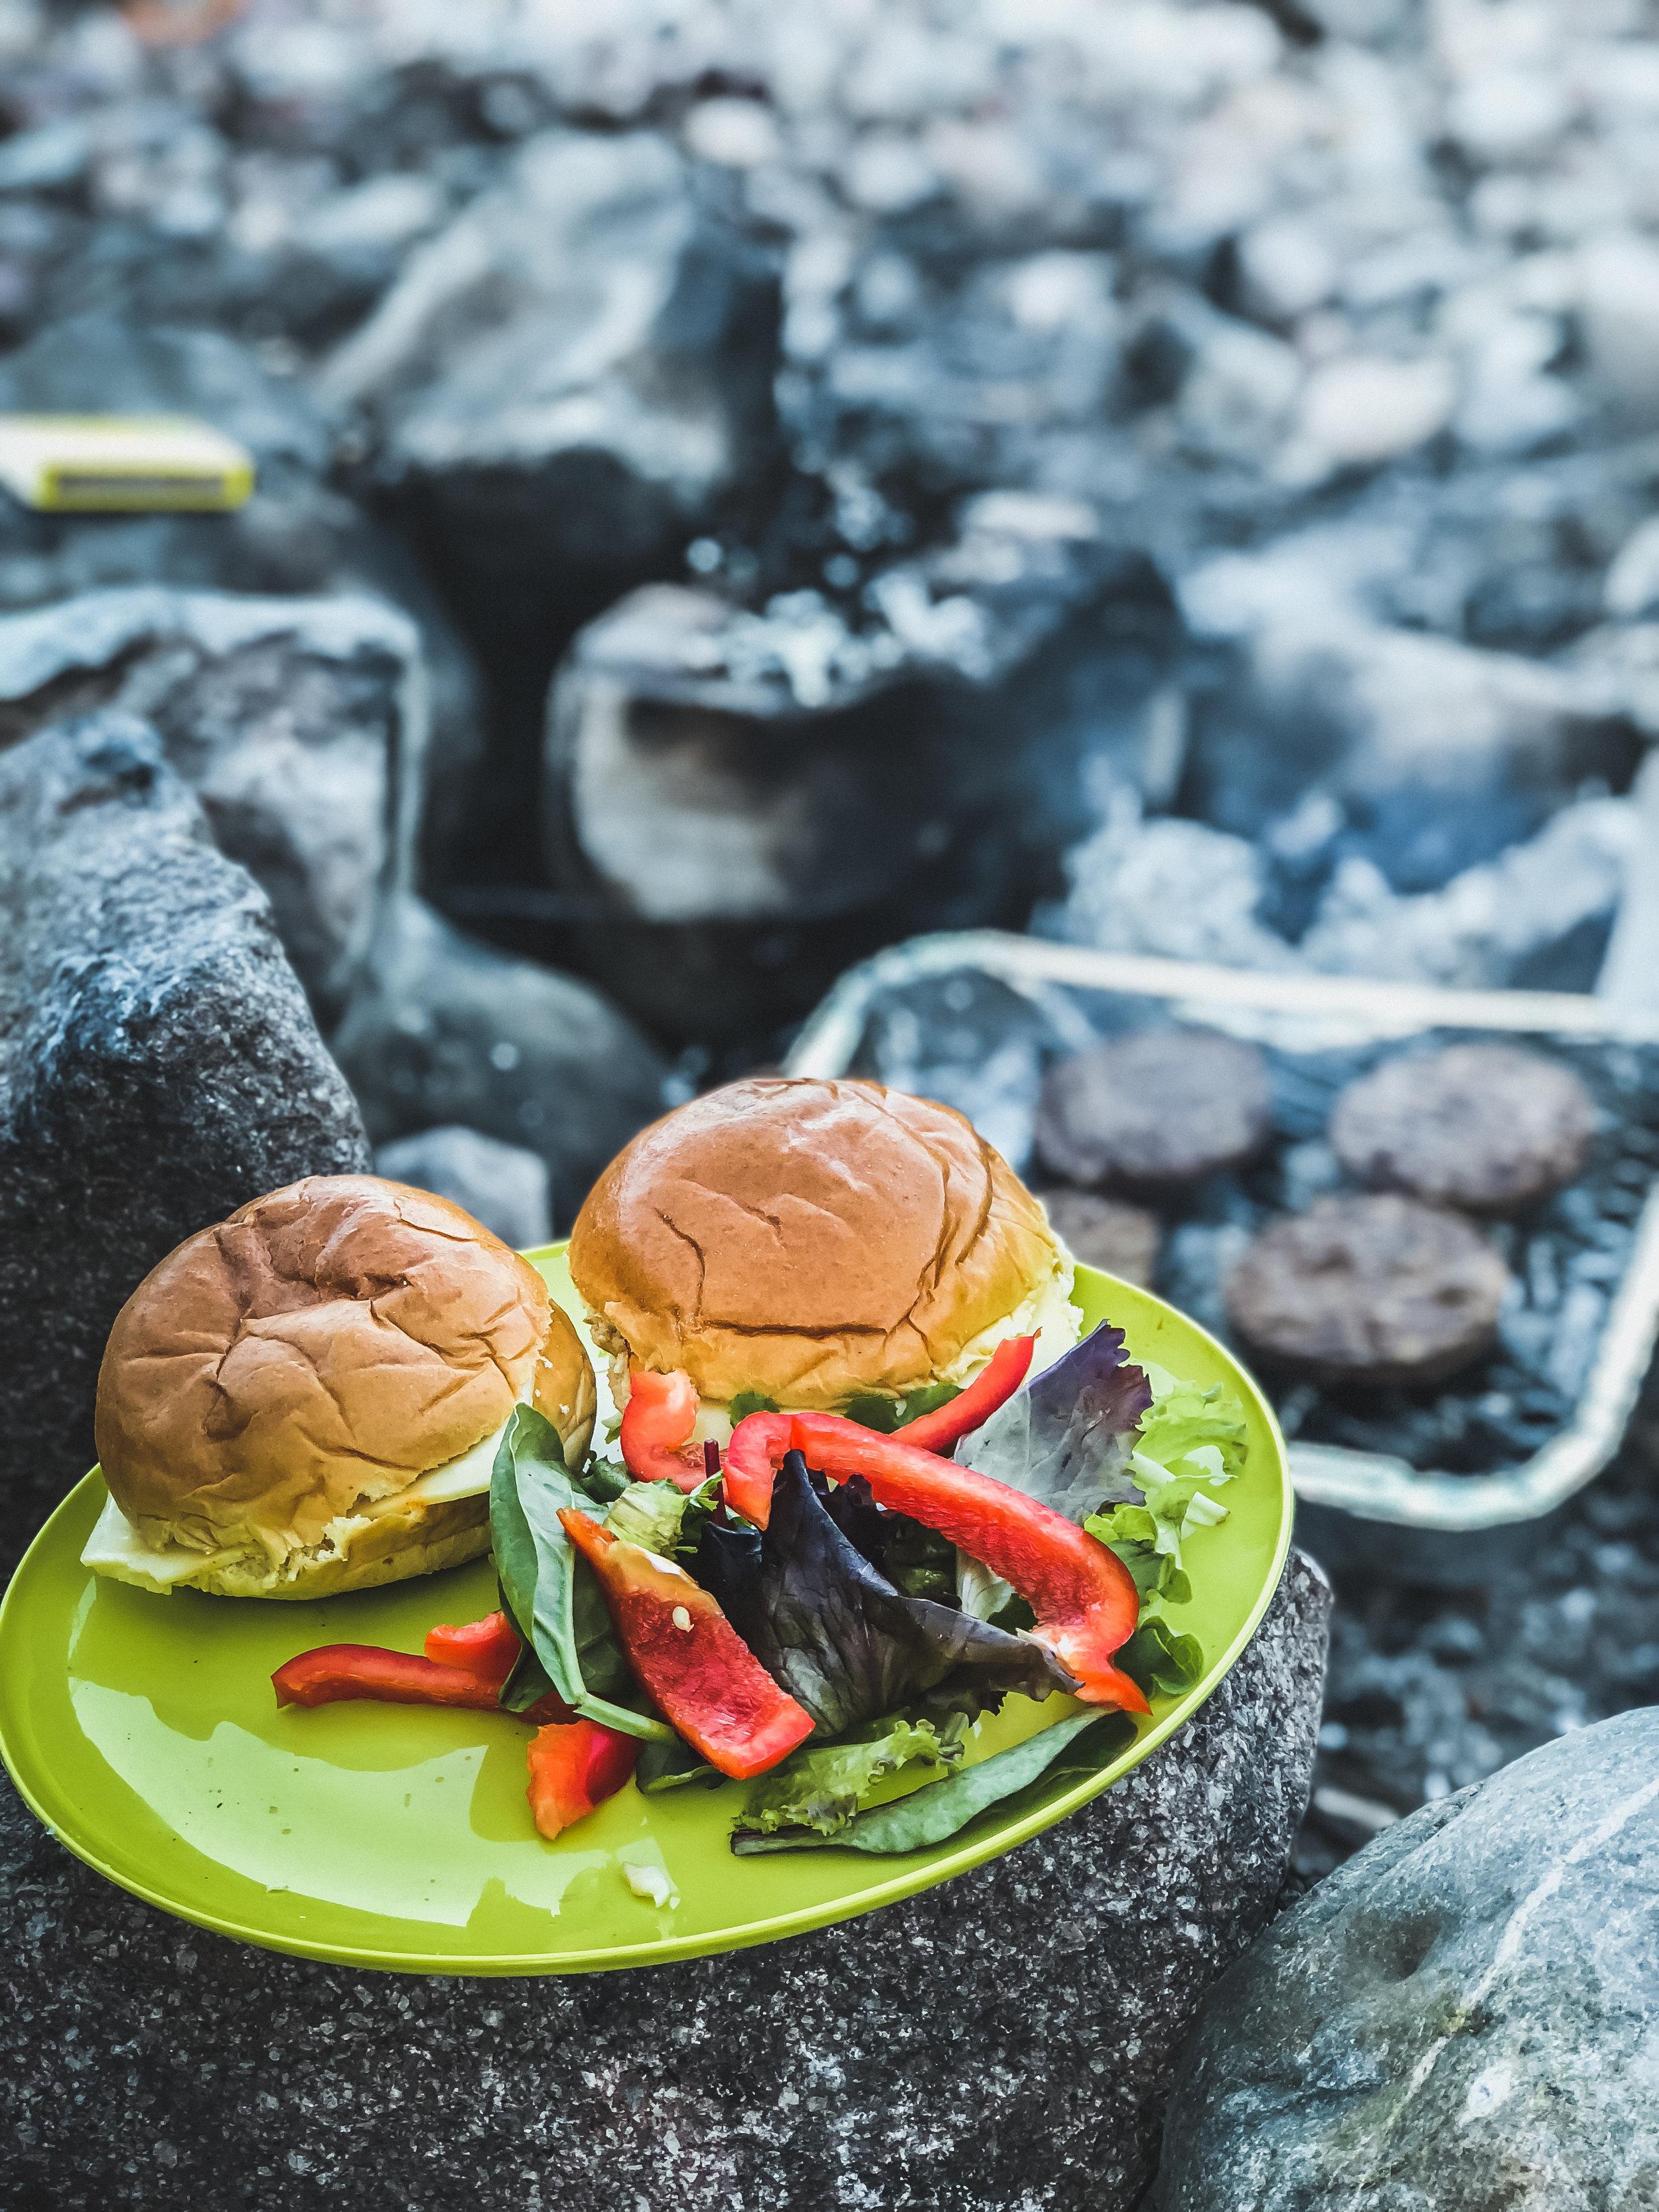 Yummy veggie burgers